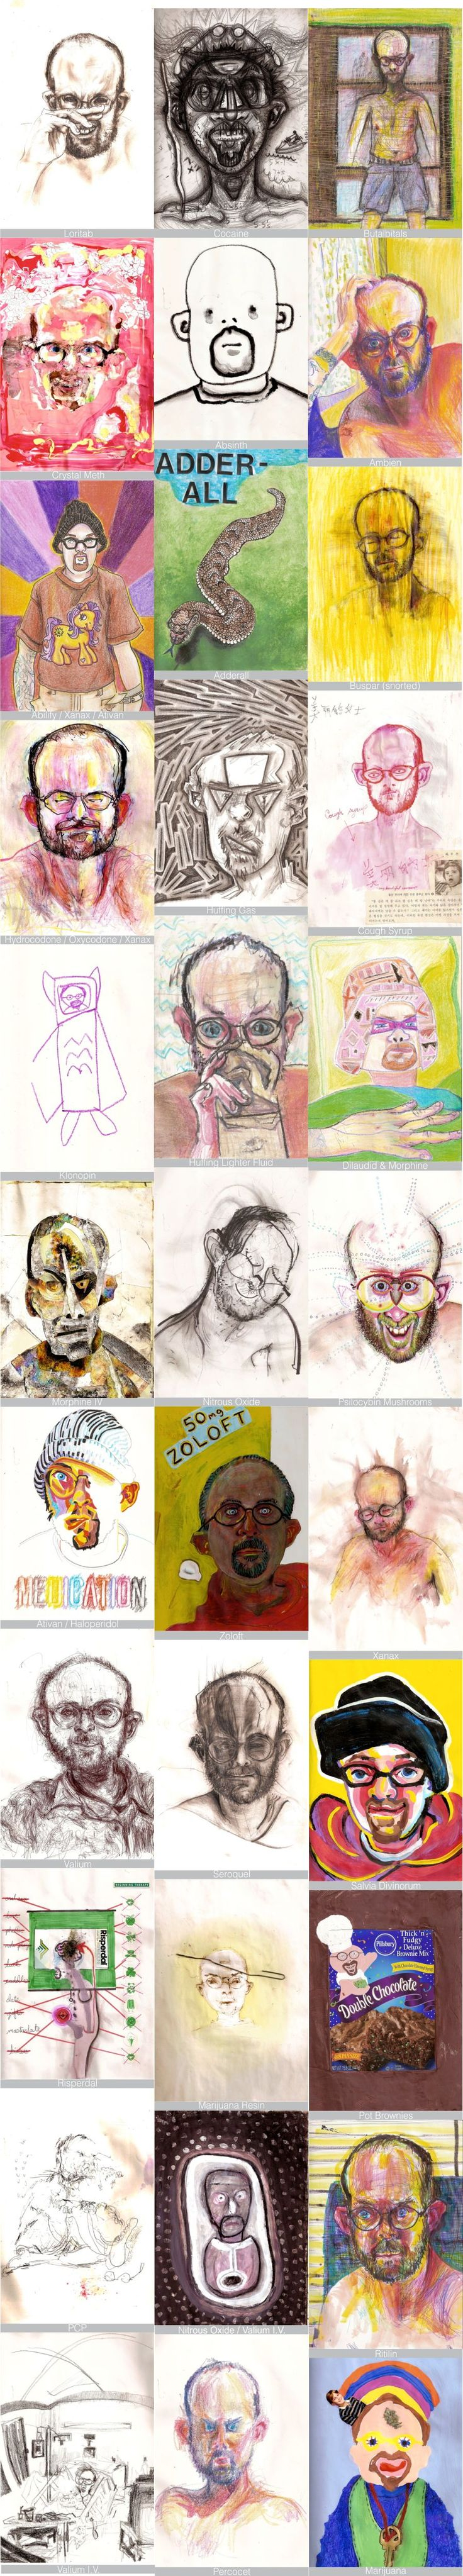 """Self Portraits under influence"" / Bryan Lewis Saunders / USA"